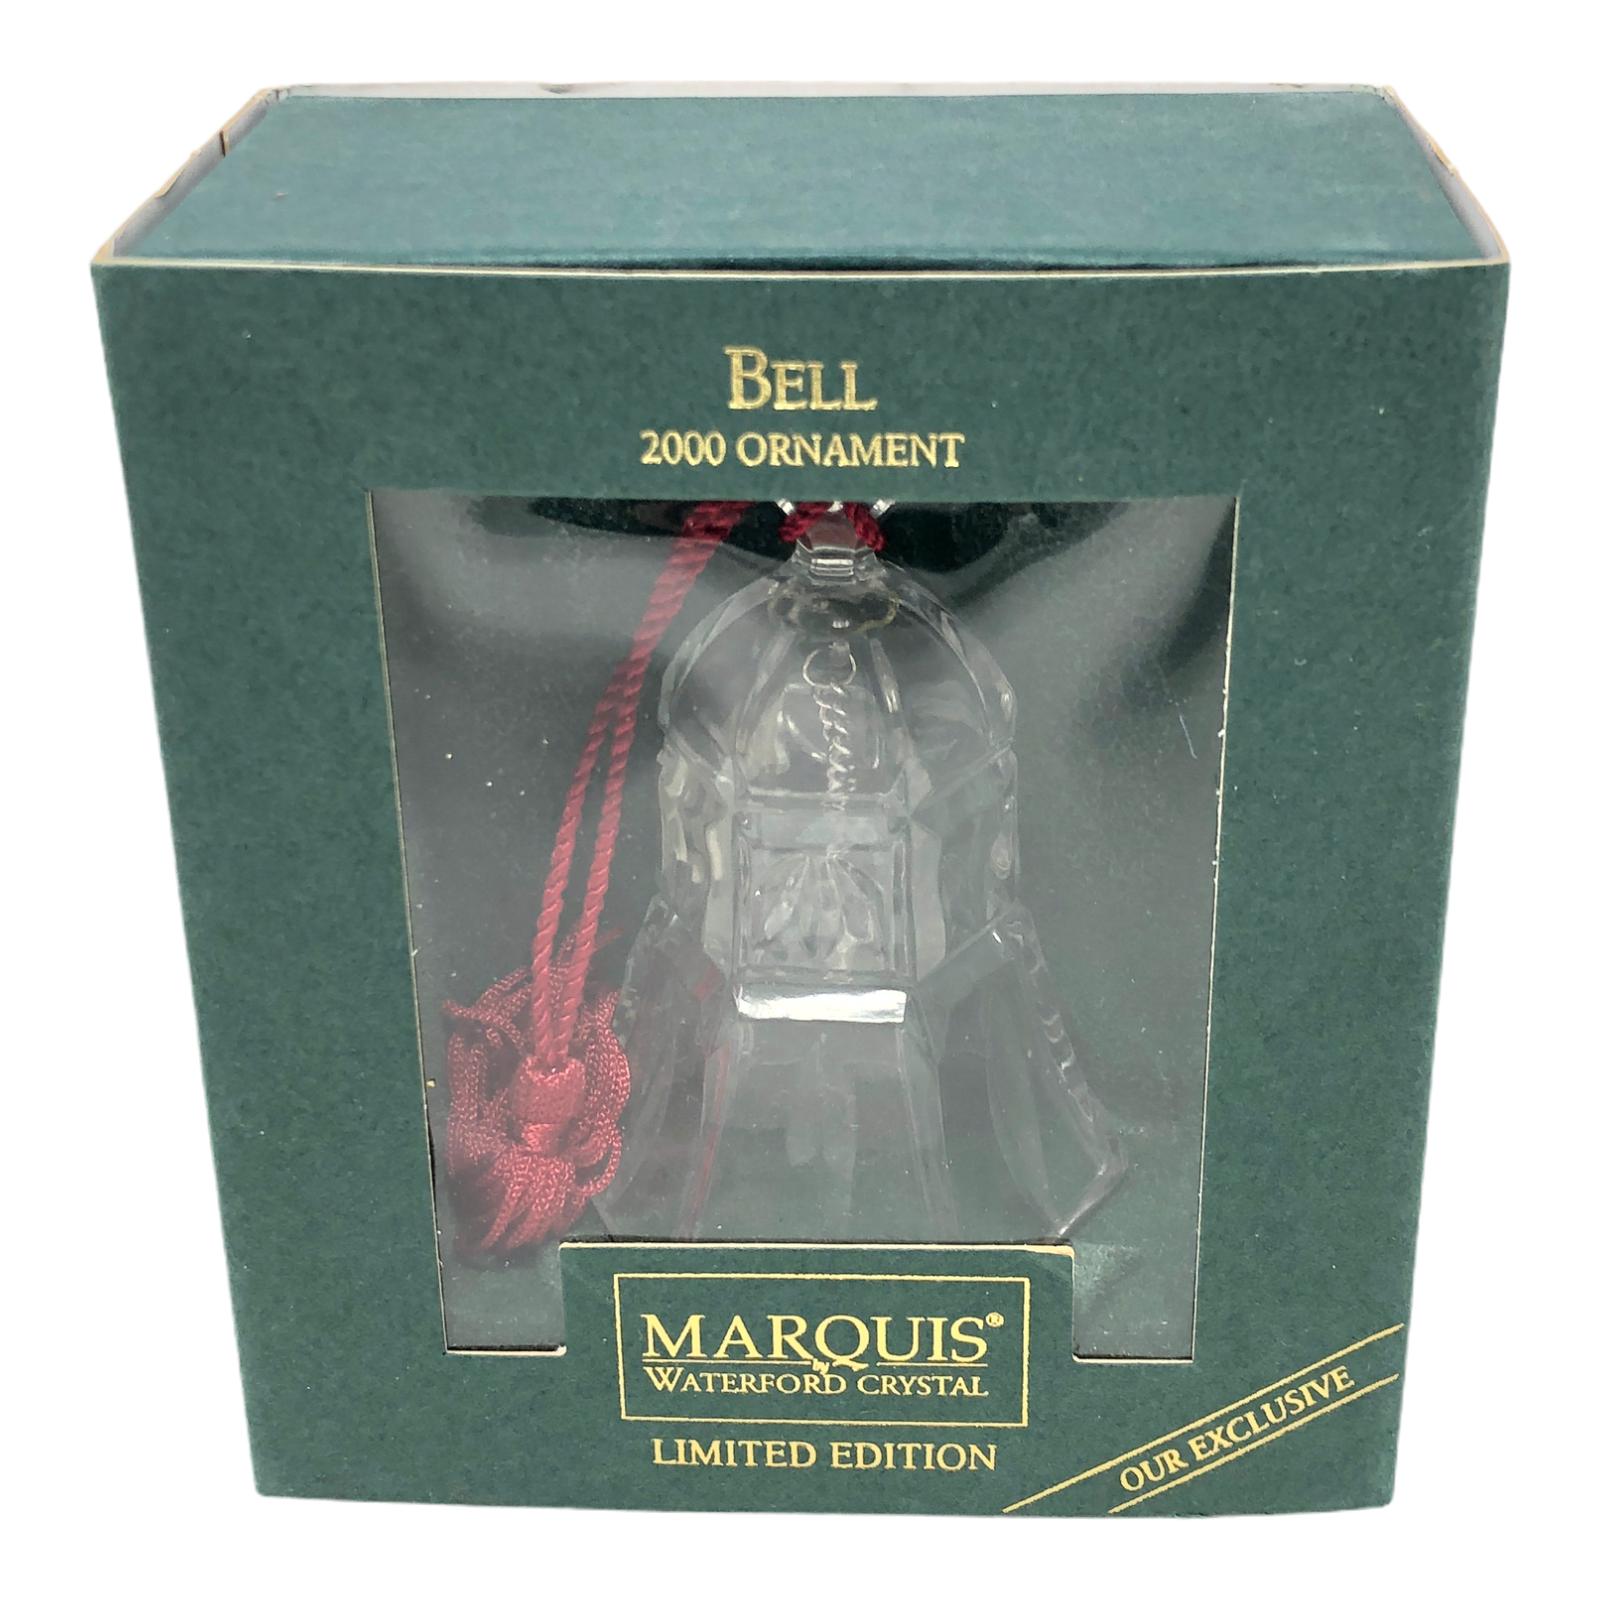 Vintage Waterford Crystal Bell Christmas Ornament Original Box 2000 - $21.77